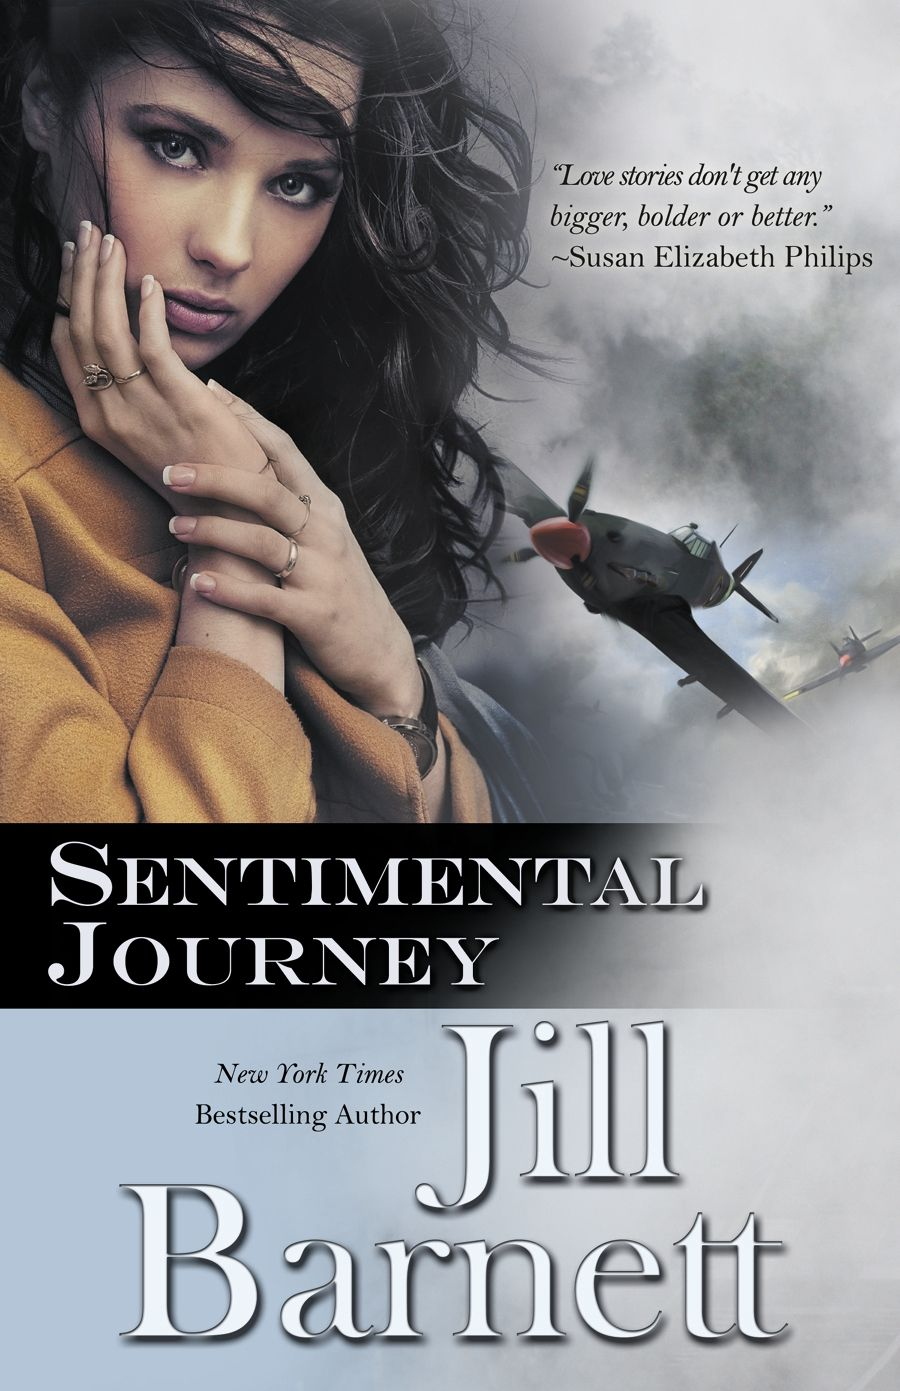 For Nook & Kindle.SENTIMENTAL JOURNEY@ $1.99. A book read by soldiers & vets. B http://www.barnesandnoble.com/w/sentimental-journey-jill-barnett/1100410701?ean=9781935661702  Amazon http://www.amazon.com/gp/product/B003YUCGMI/ref=as_li_qf_sp_asin_il_tl?ie=UTF8=1789=9325=B003YUCGMI=as2=httpwwwjillba-20